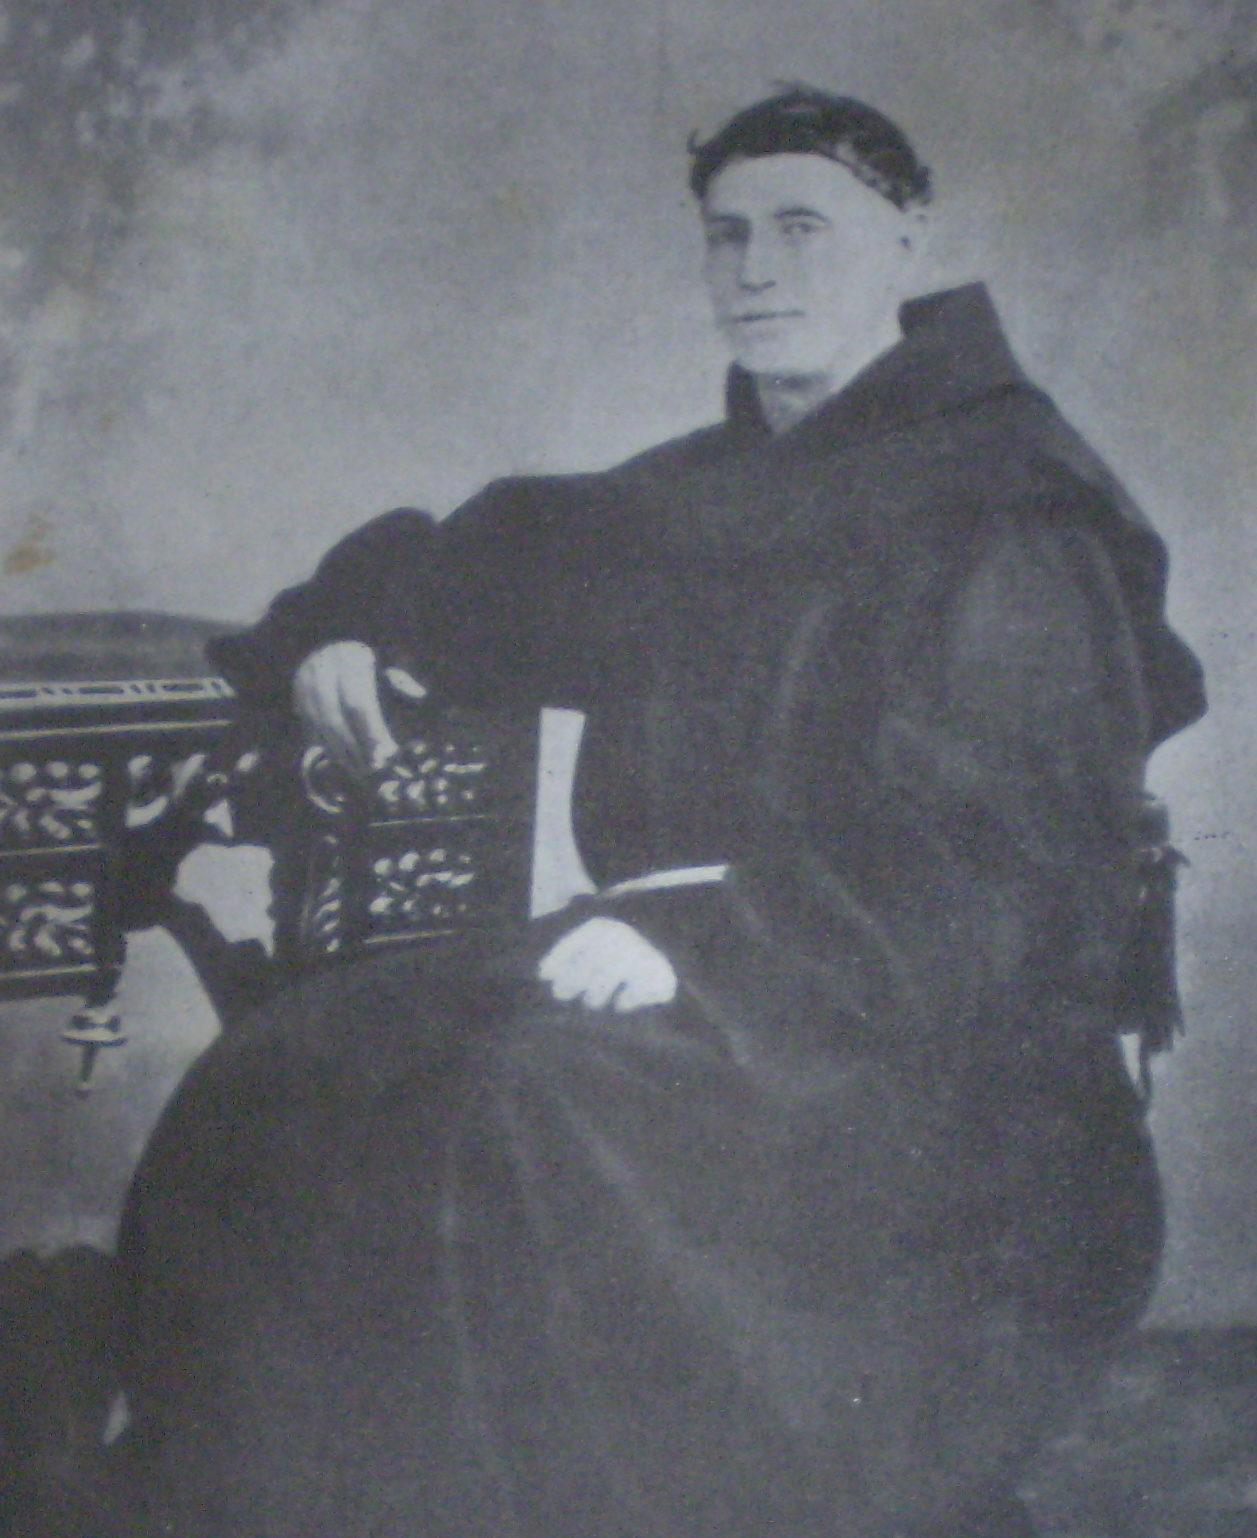 Mgr Mamerto Esquiú @ Domaine publique